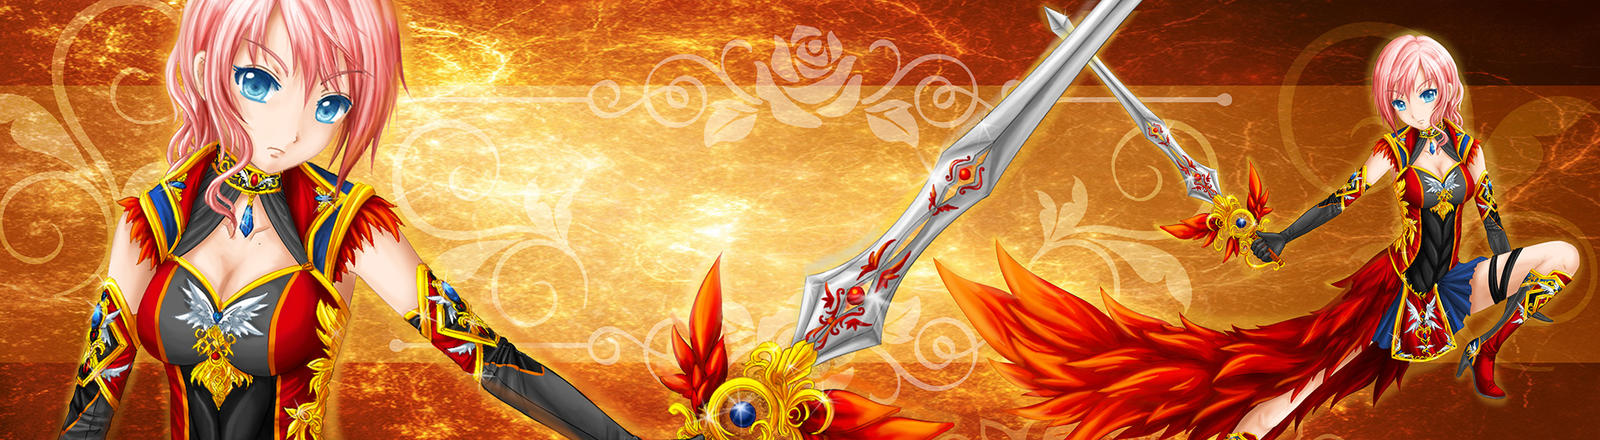 Final Fantasy XIII:Lightning returns Customization by Eranthe